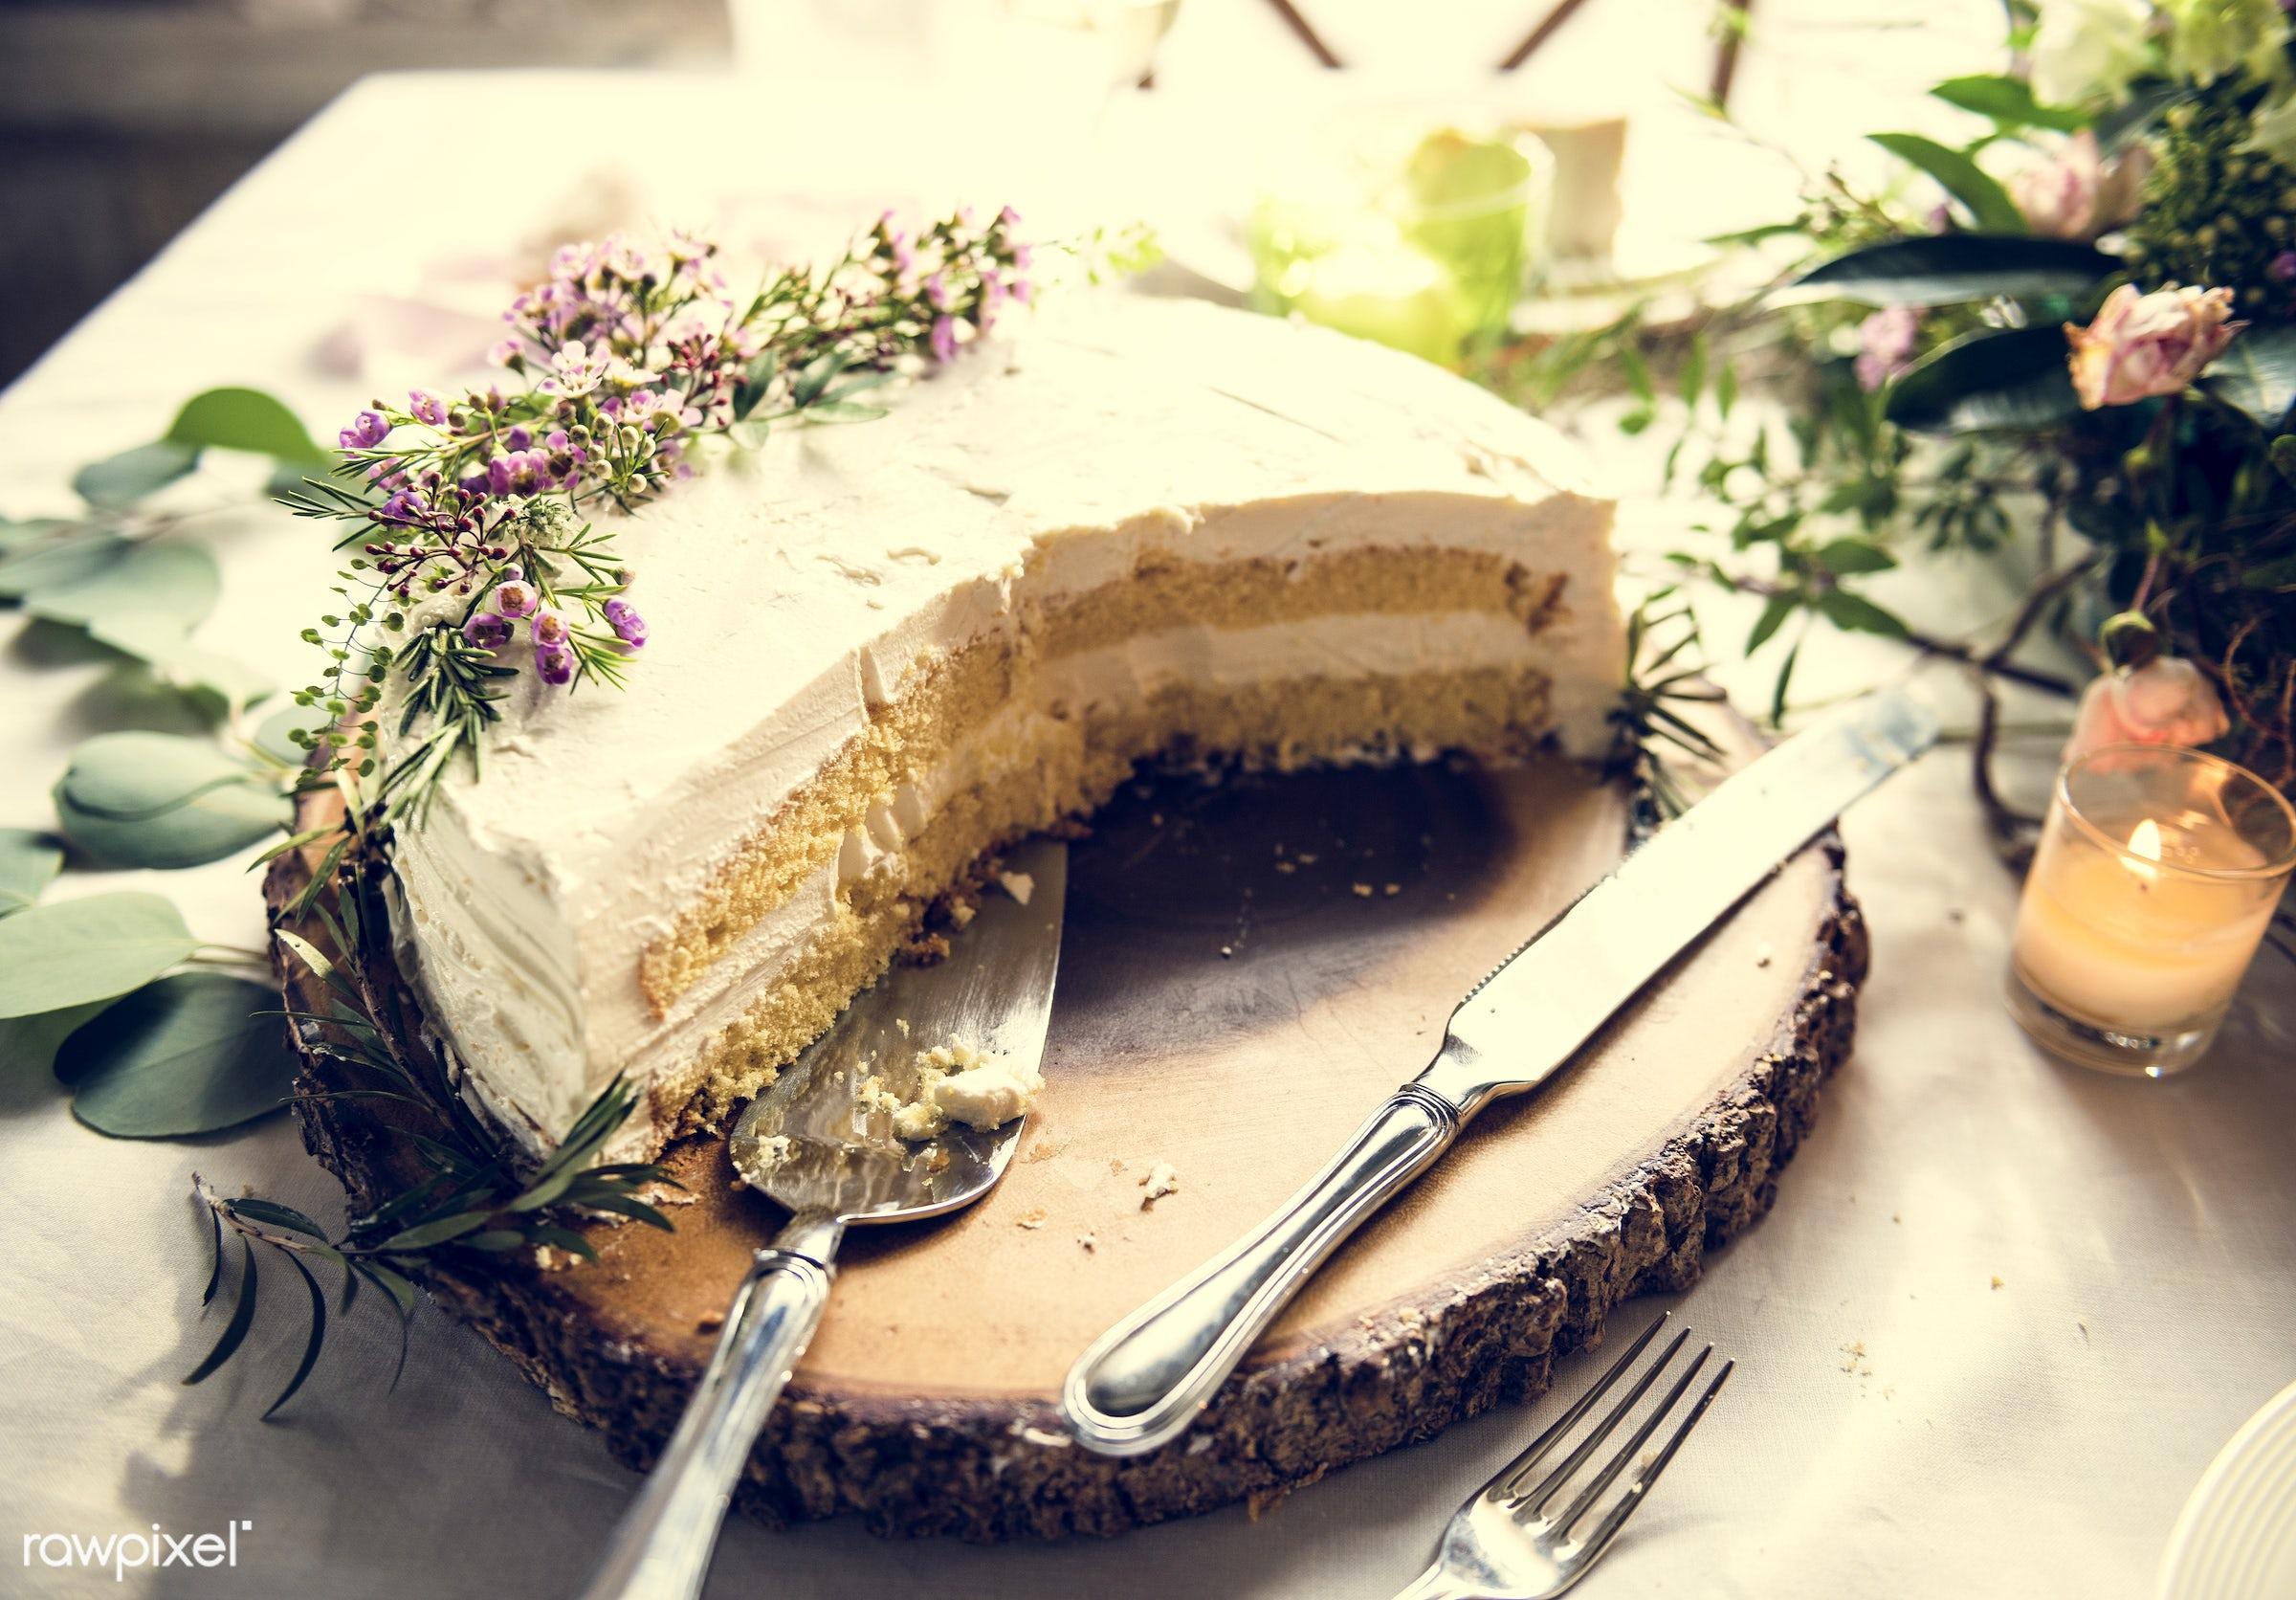 dish, nobody, birthday, recipe, catering, bake, party, baked, break, bakery, frosting, event, celebrate, gourmet, dessert,...